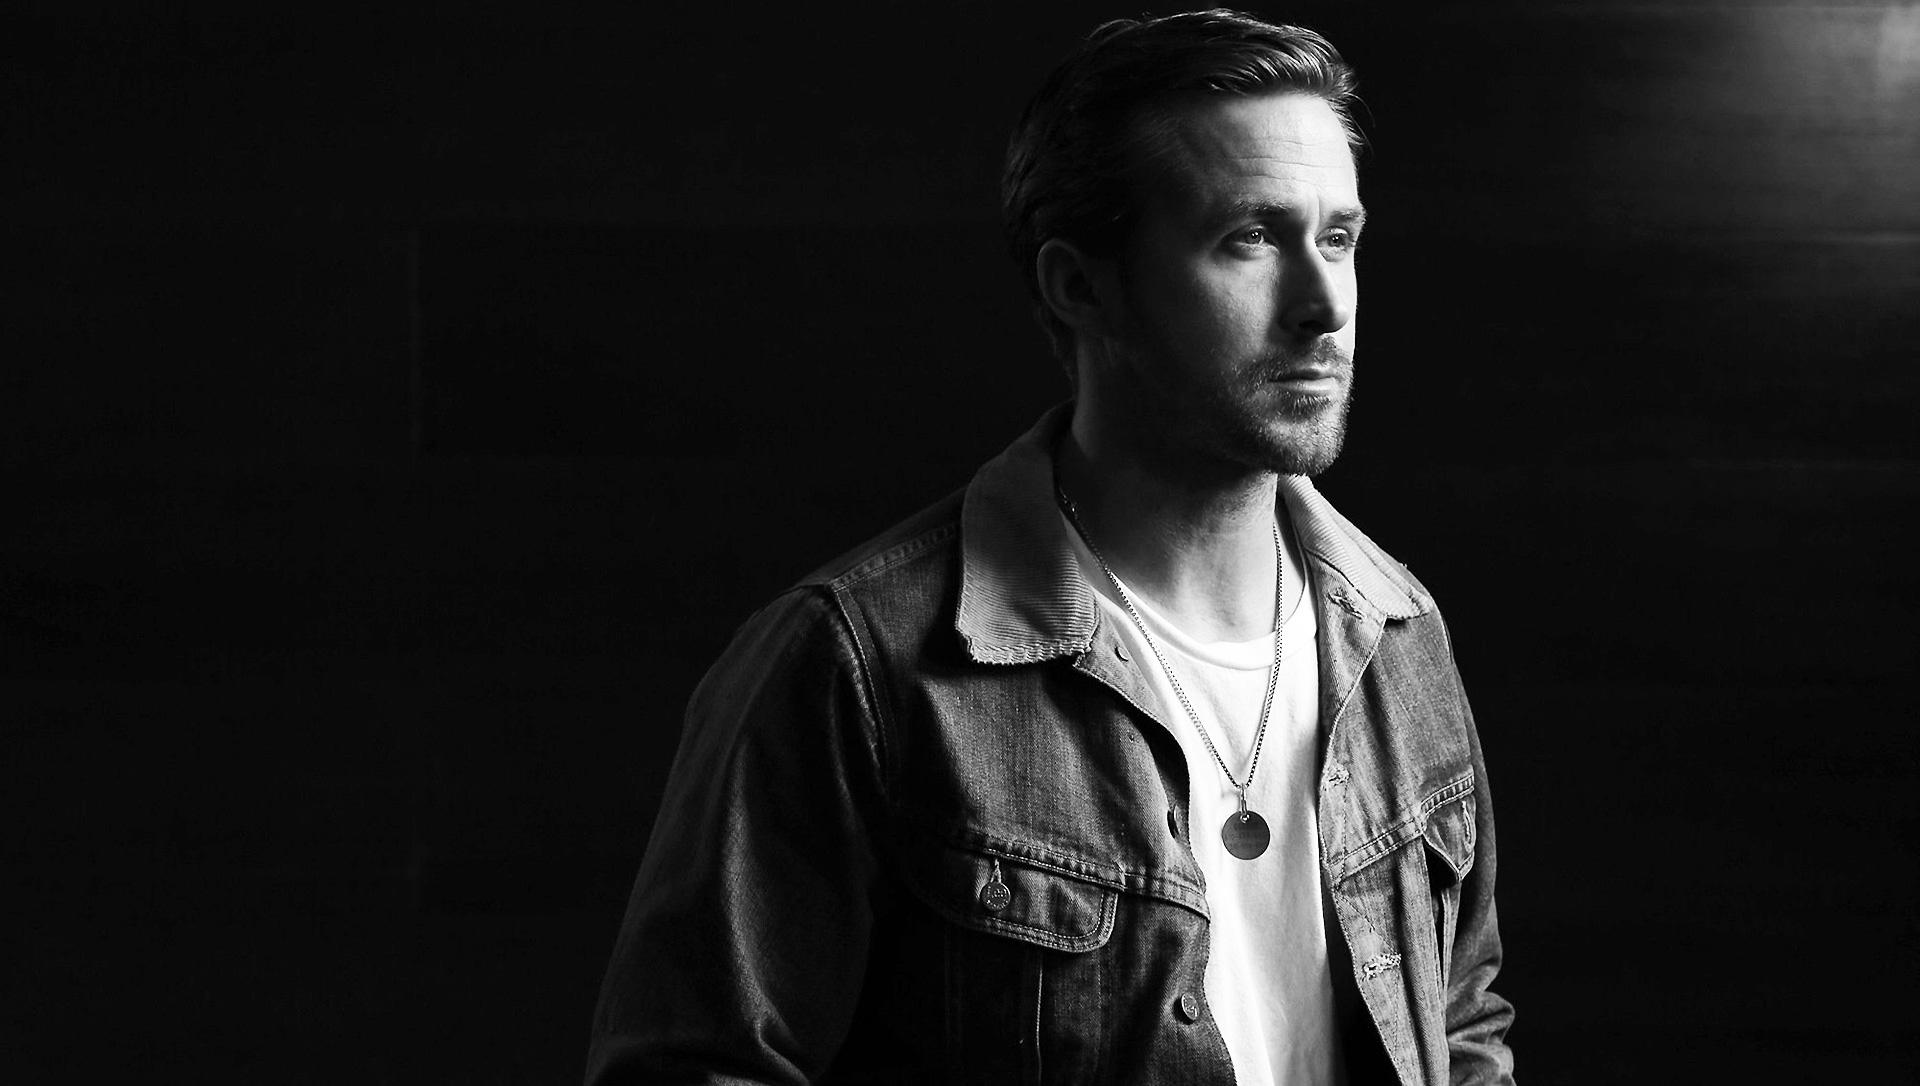 Ryan Gosling is the Future